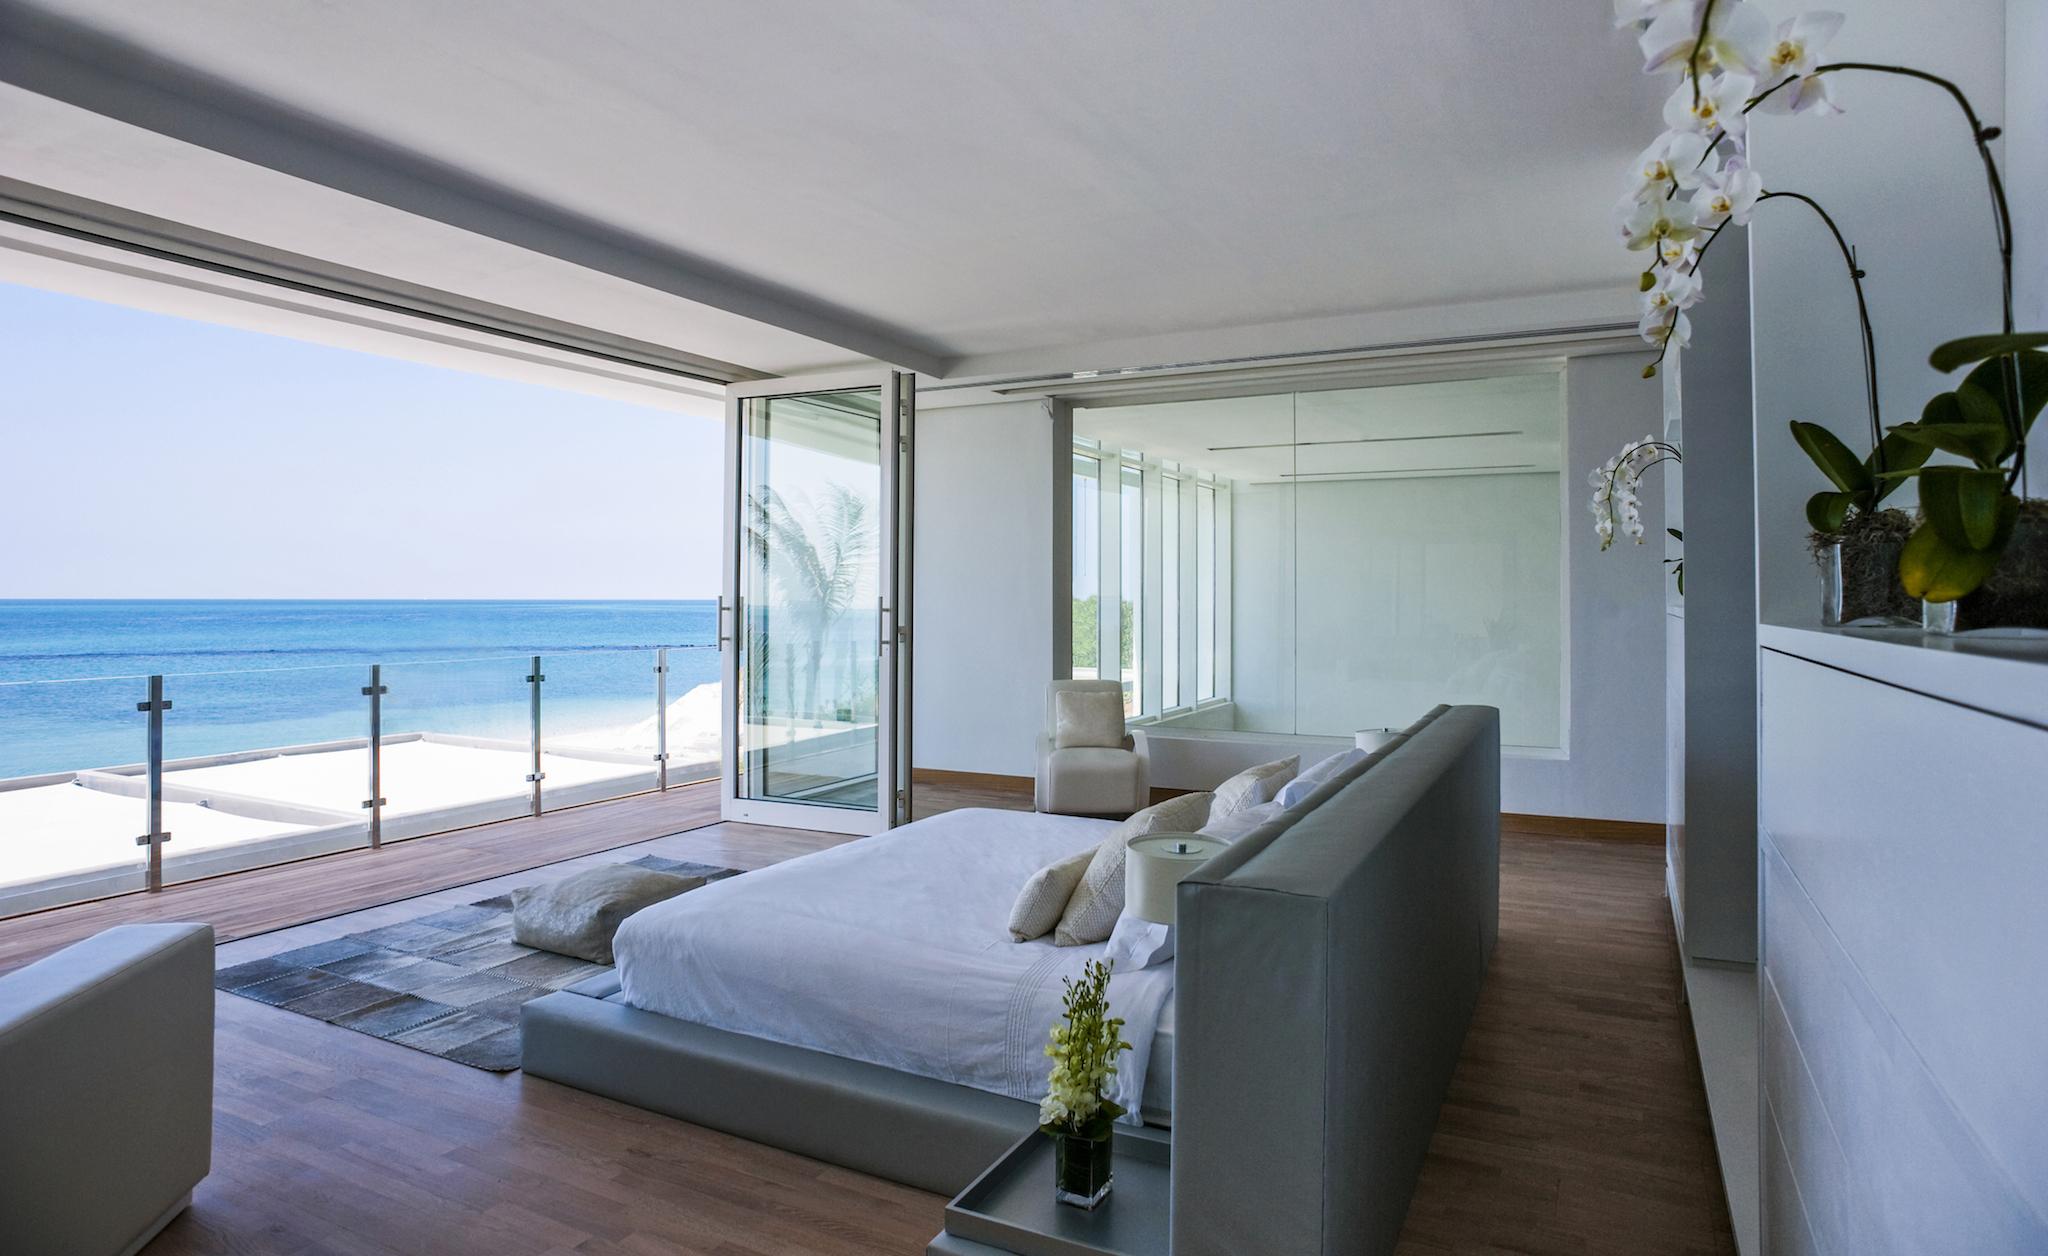 Property For Sale at Beachfront Estate Nurai Island